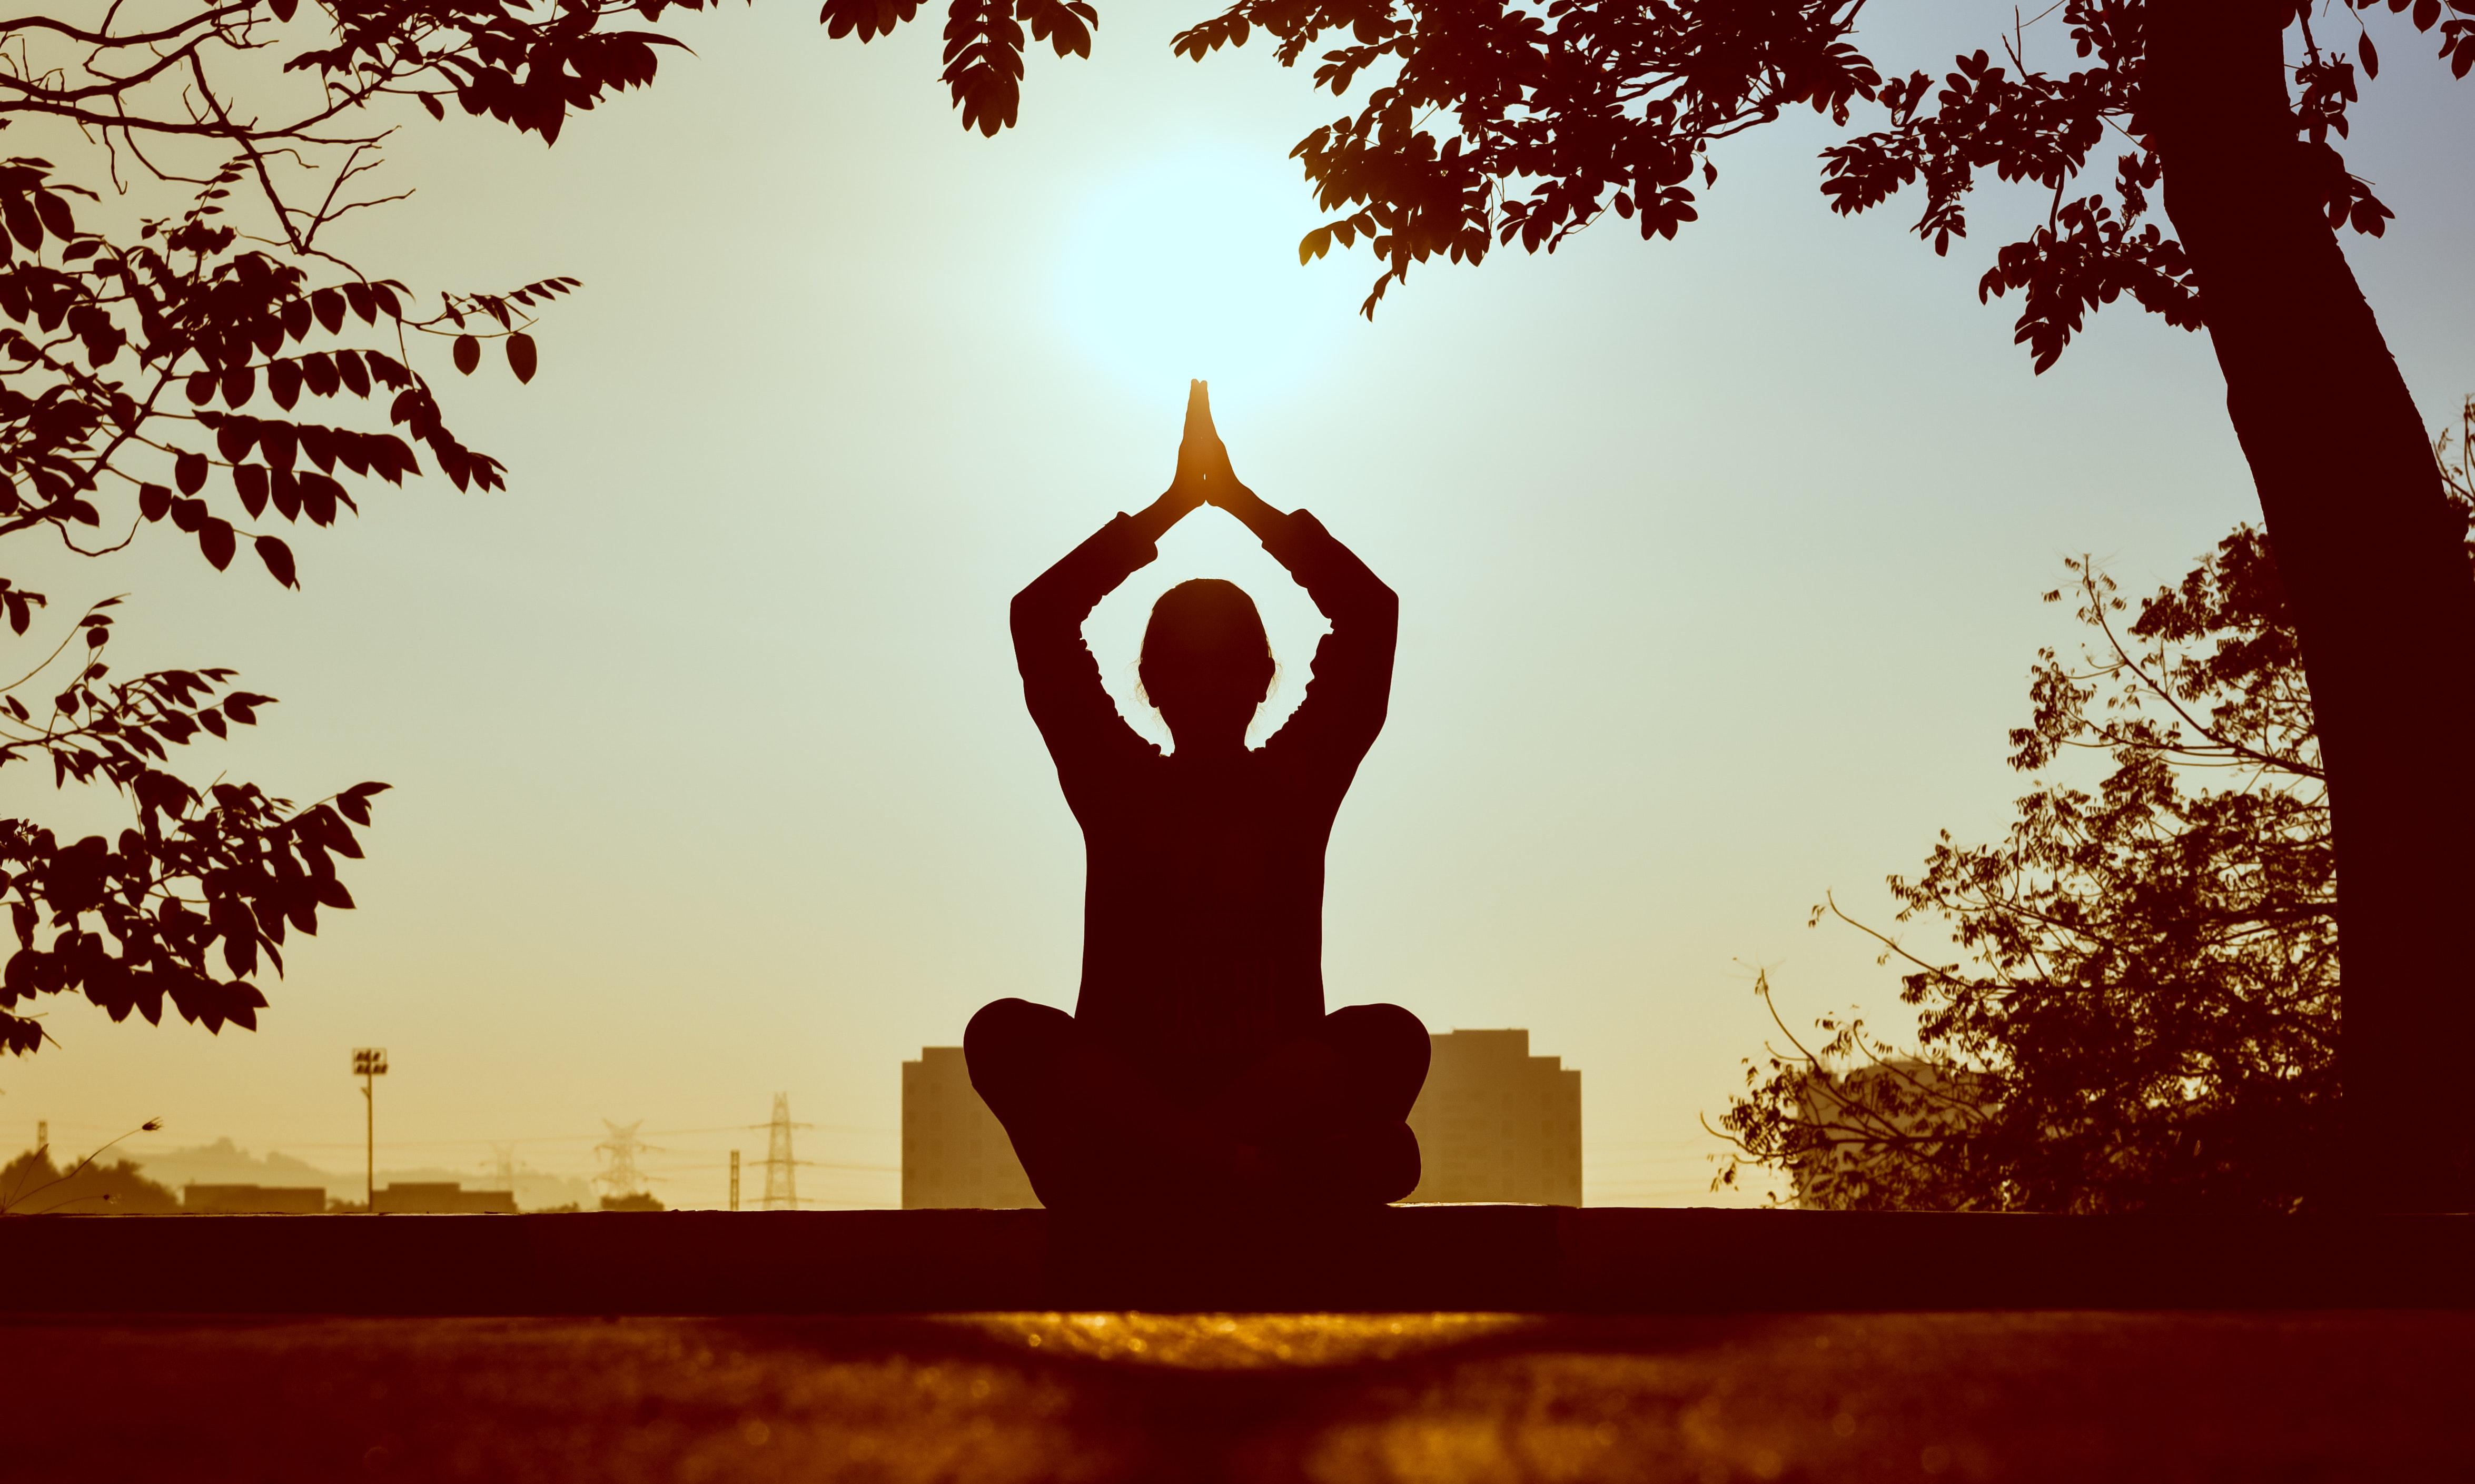 Séance hebdomadaire de Méditation Pleine Conscience via Zoom @ ॐ La Source ॐ